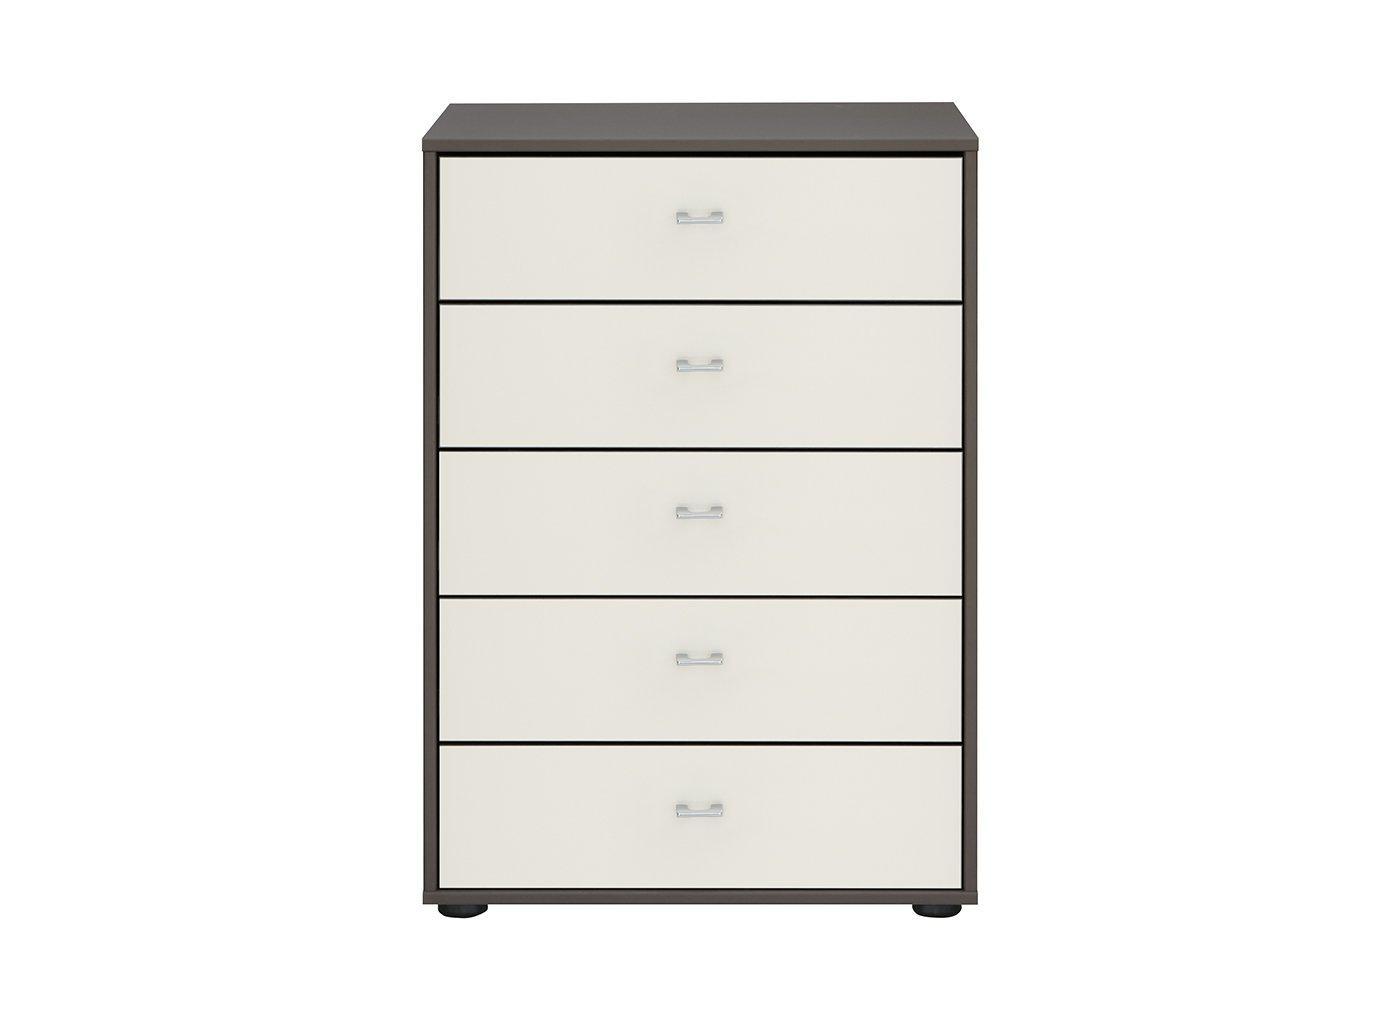 memphis-5-drawer-chest---grey